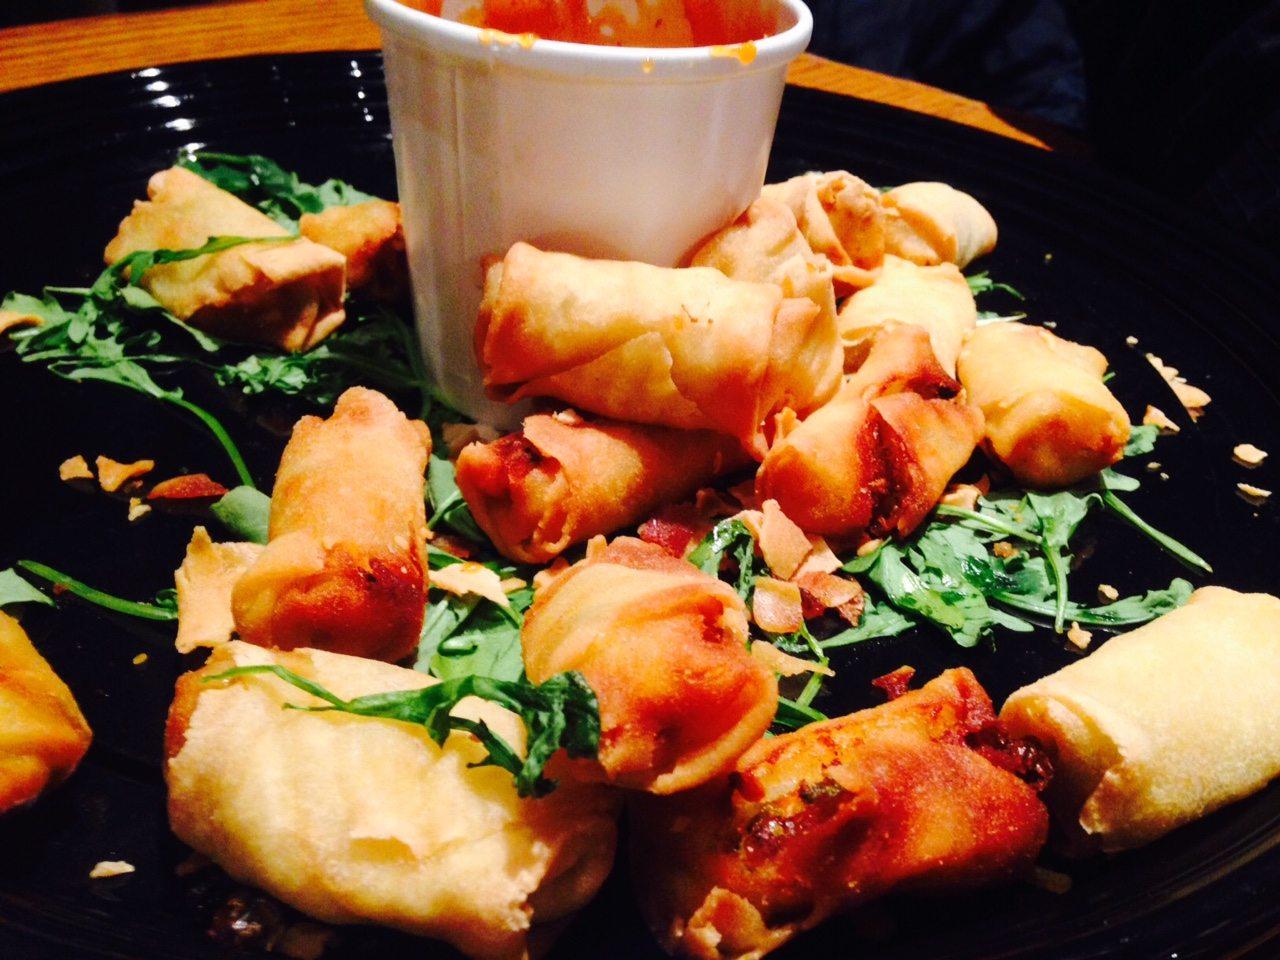 toronto-chefs-restaurants-consumed-bob-blumer-food-network-surreal-gourmet-spring-roll-bites